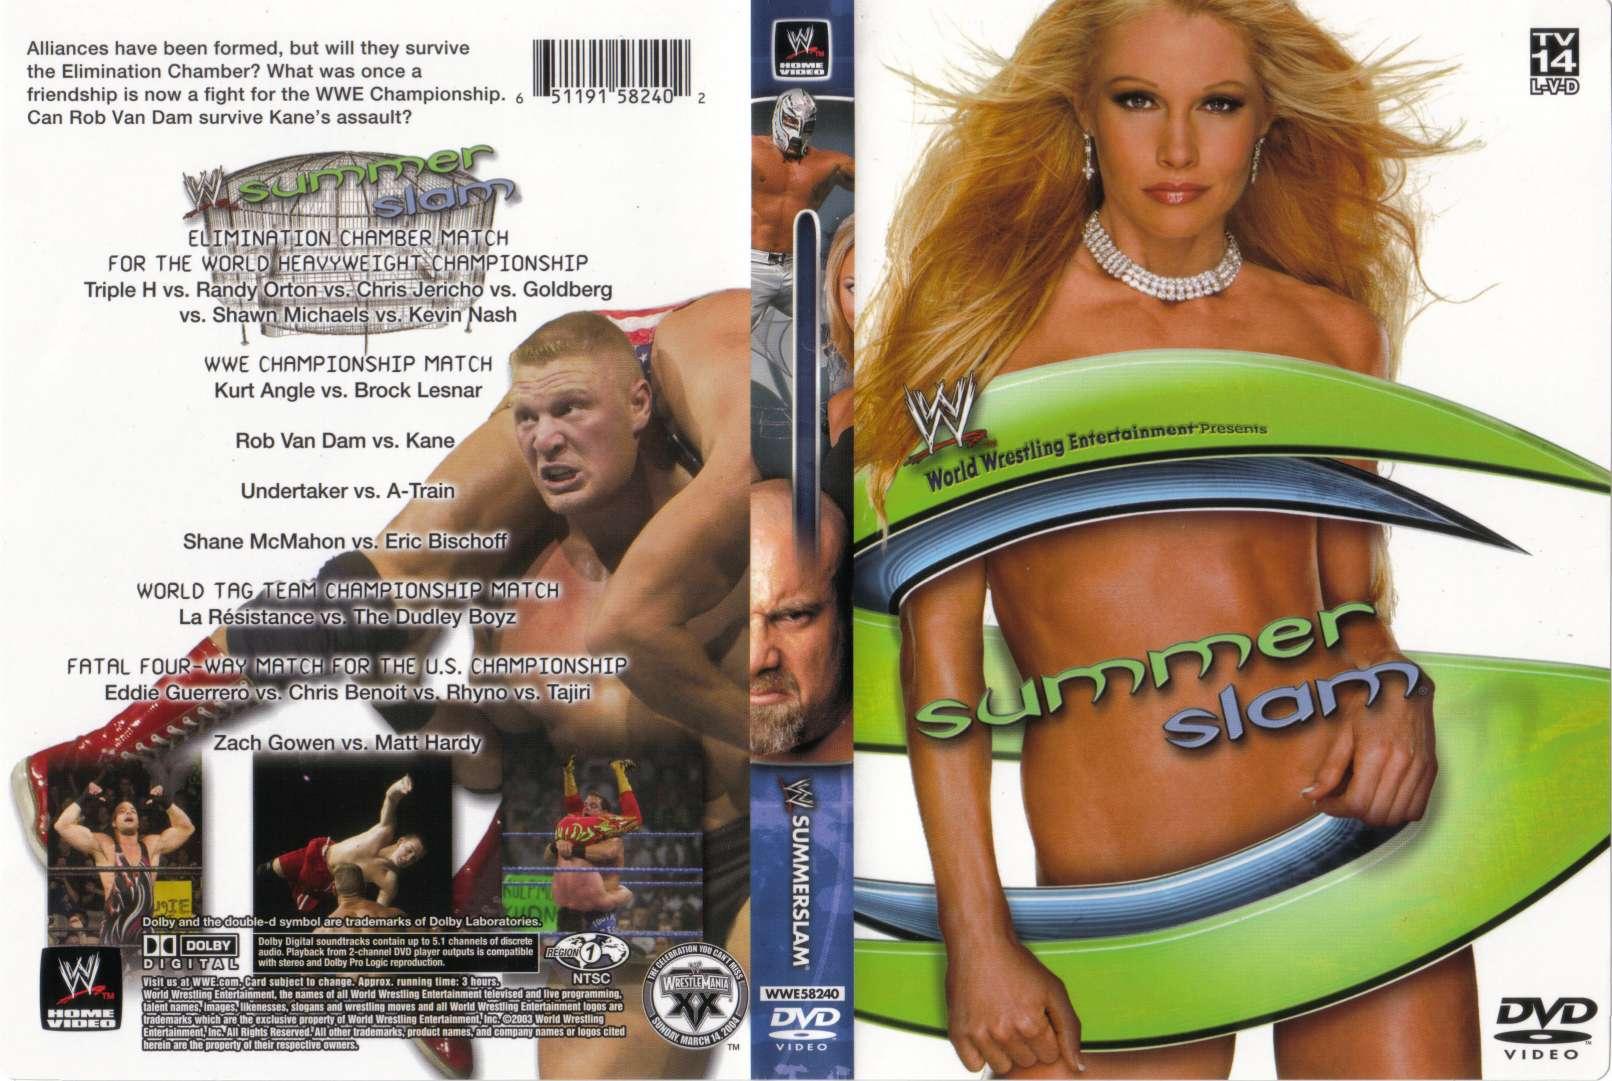 WrestleRant Edition #264: WWE SummerSlam 2003 Review - YouTube